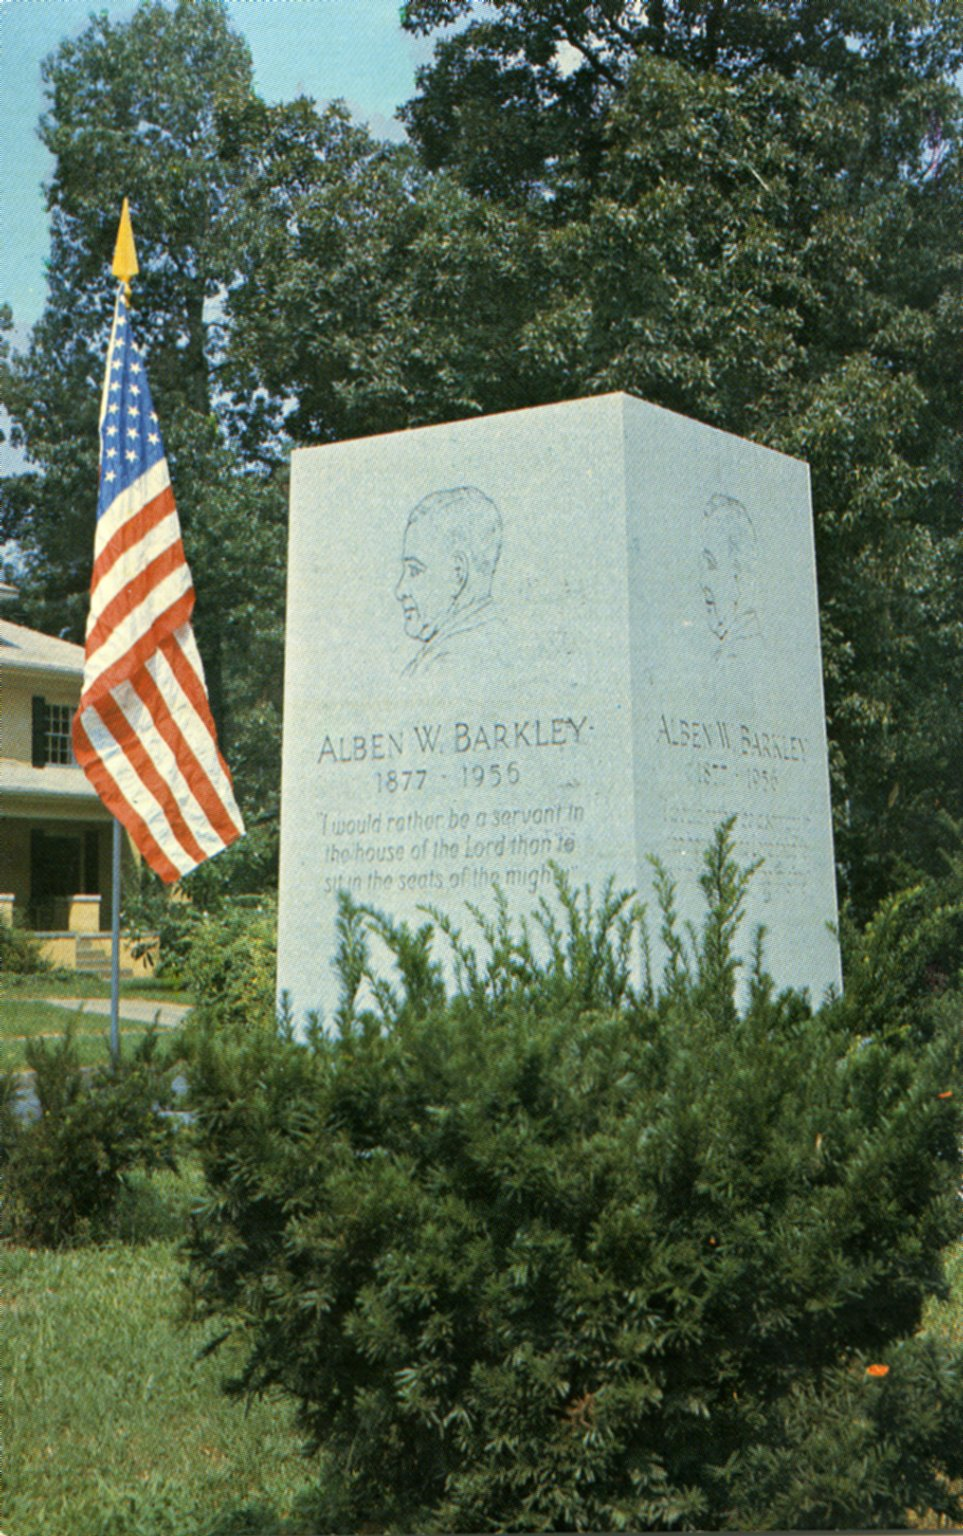 Alben W. Barkley Memorial, Paducah, KY.